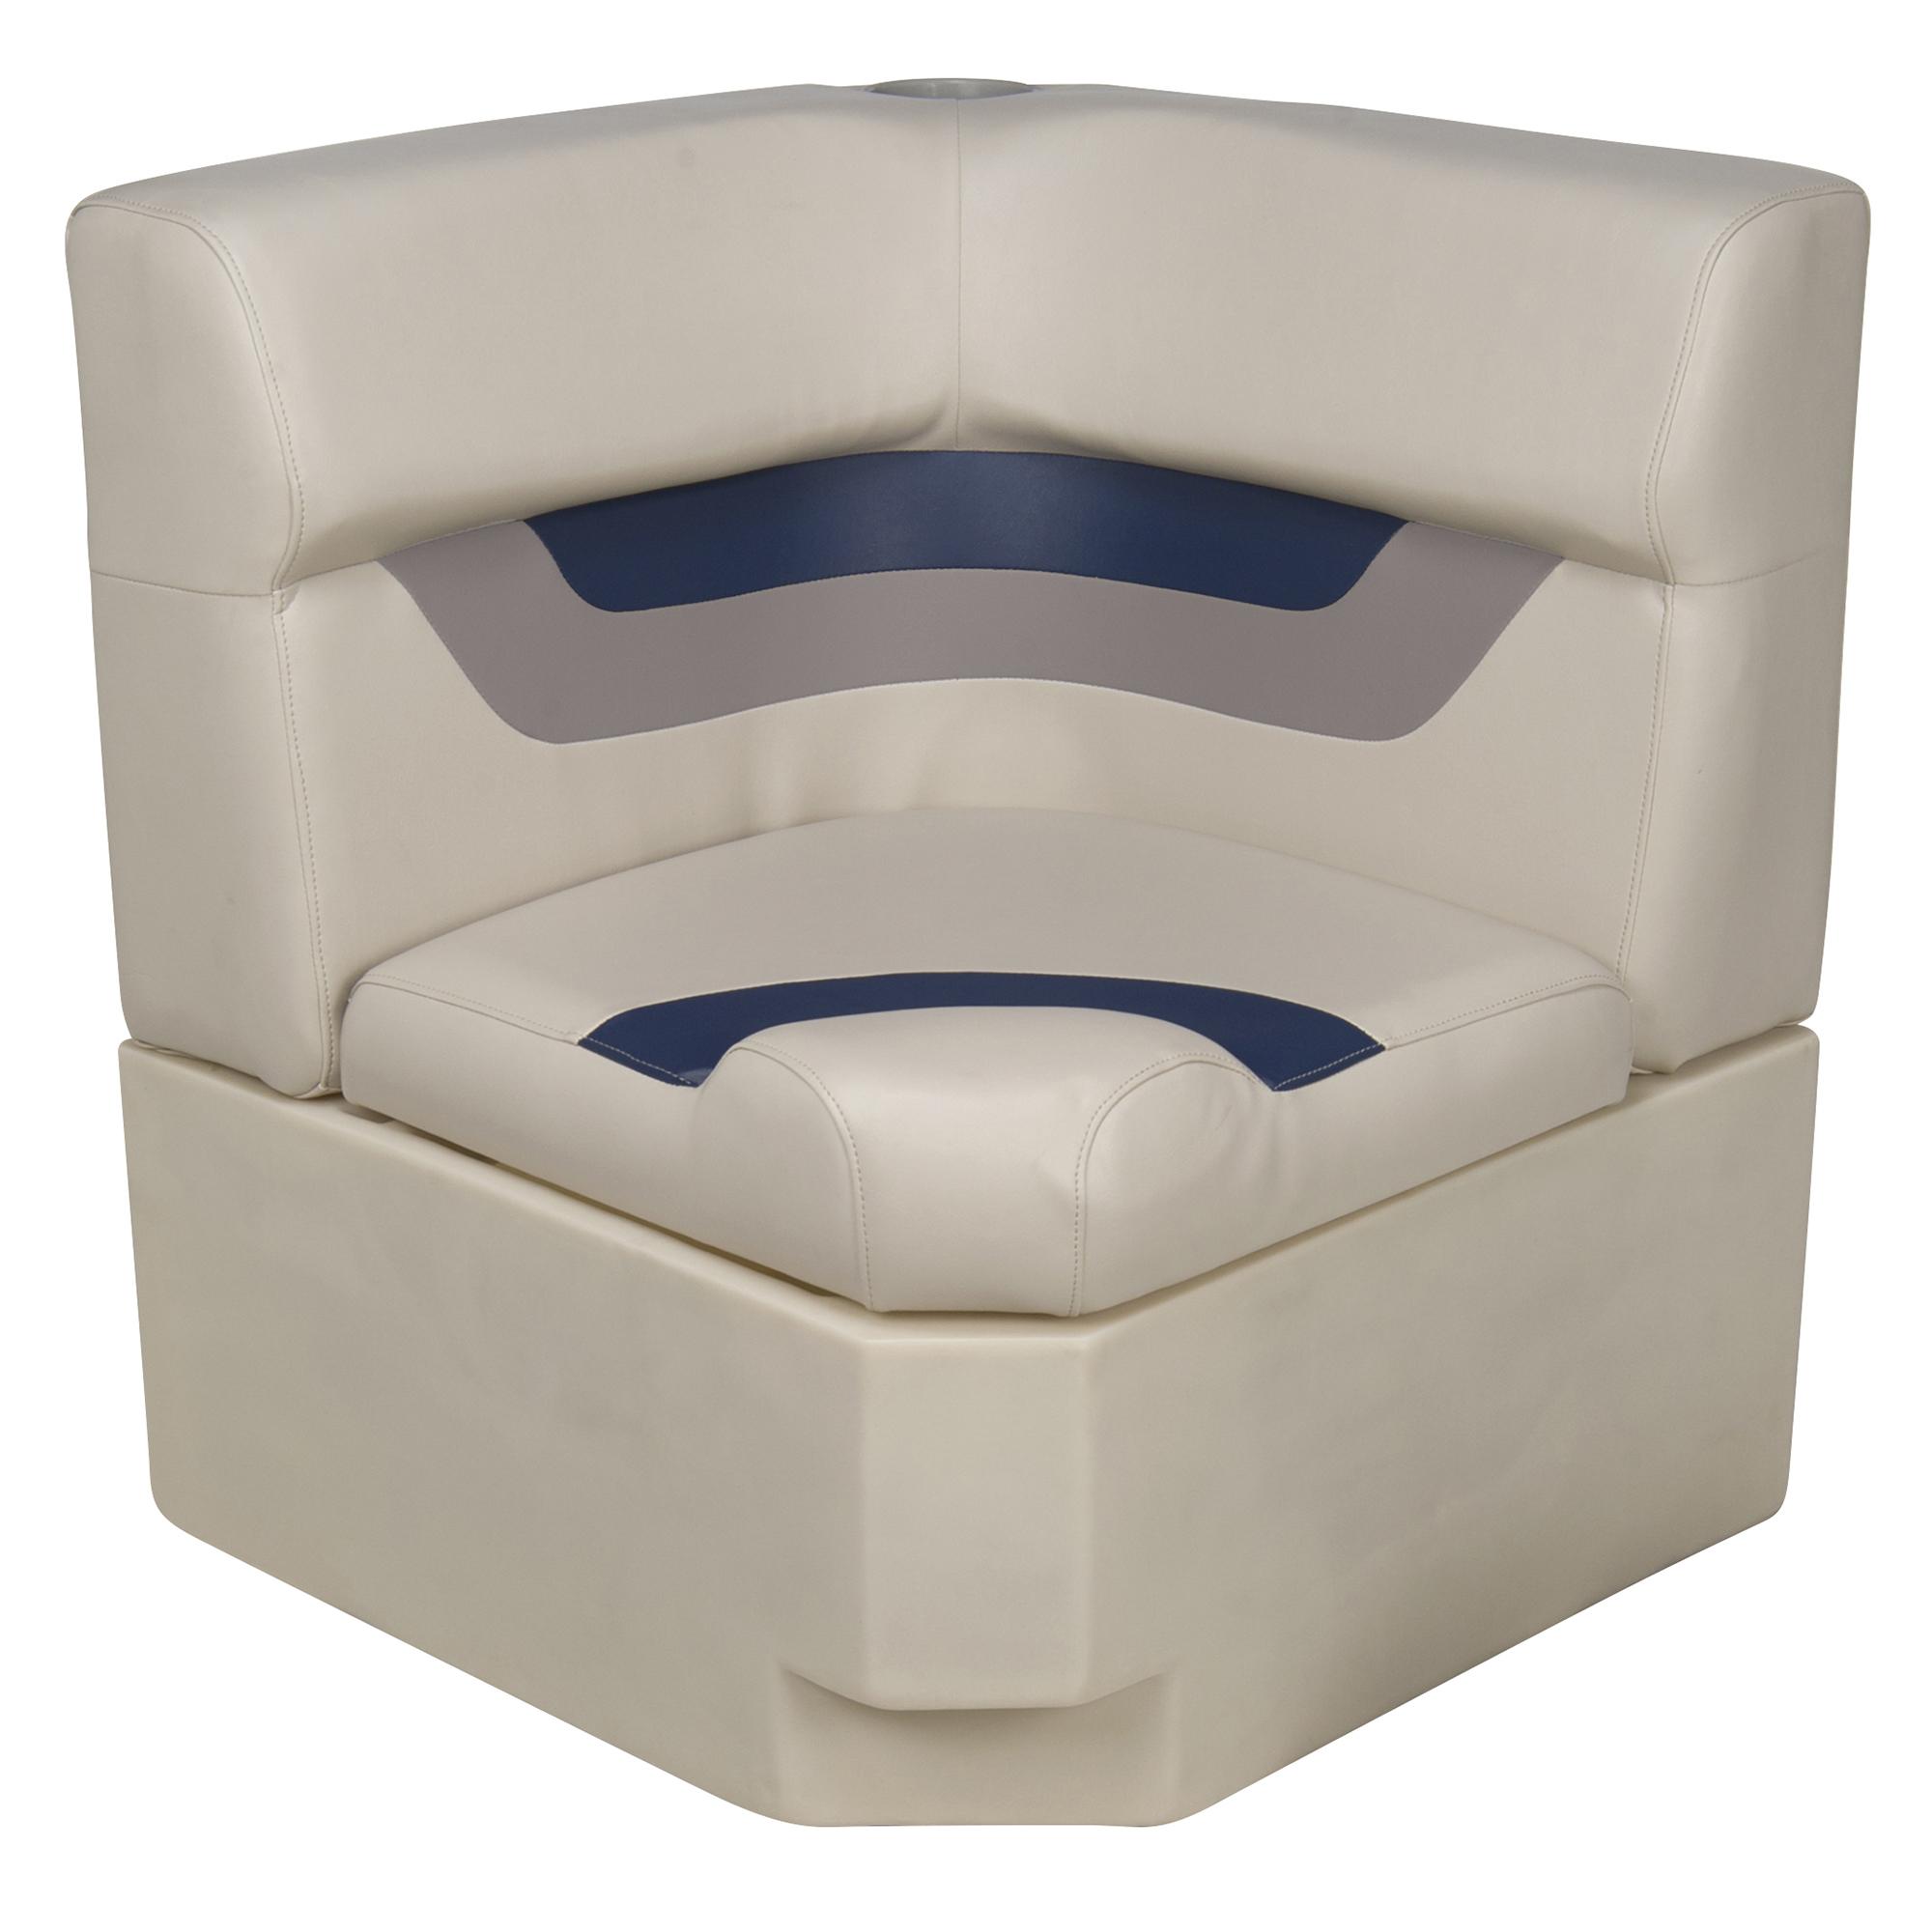 Toonmate Designer Pontoon Corner Section Seat Top